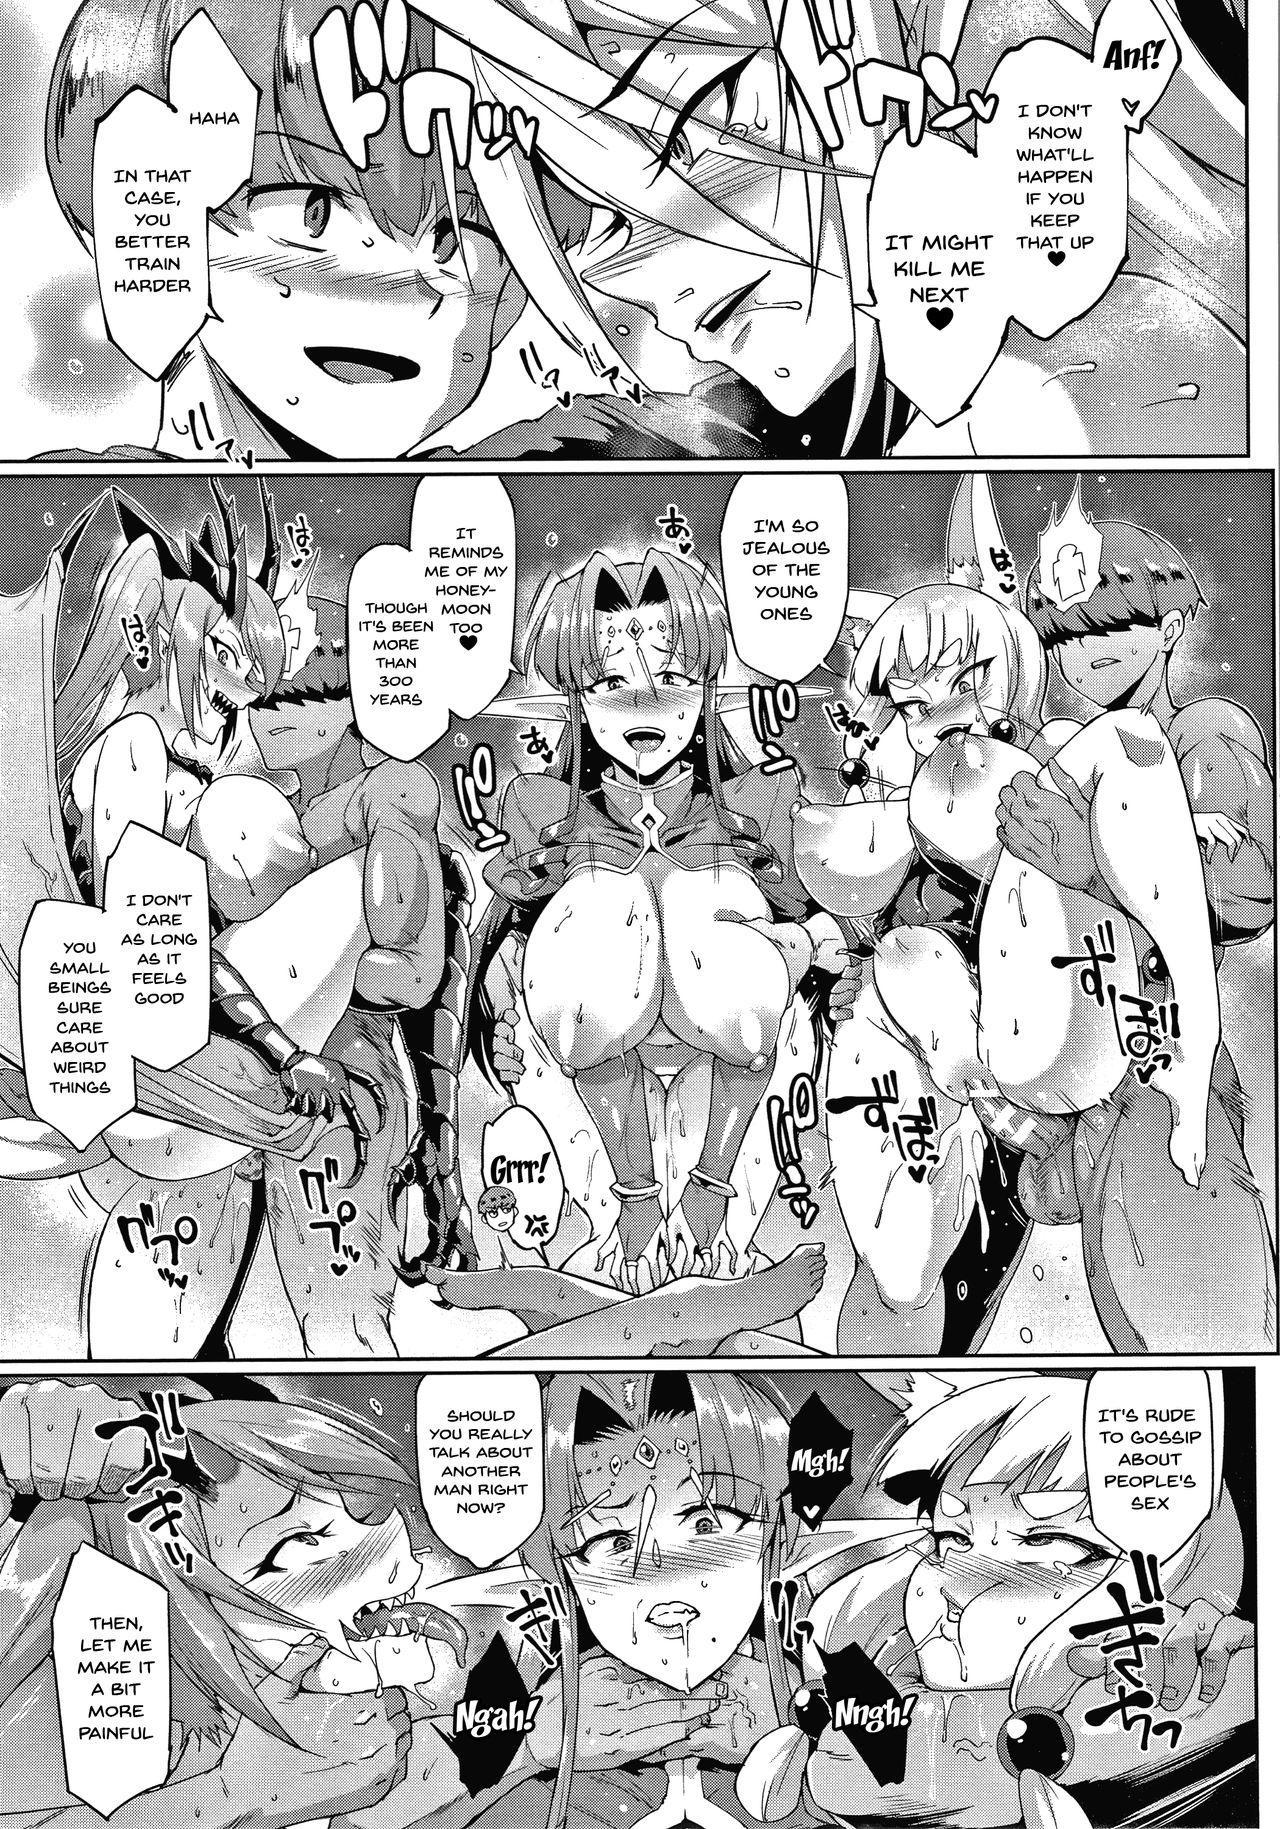 [Fan no Hitori] Sennen Reijou ~My Lady, My Master~  Ch.1-6 [English] {Doujins.com} 119